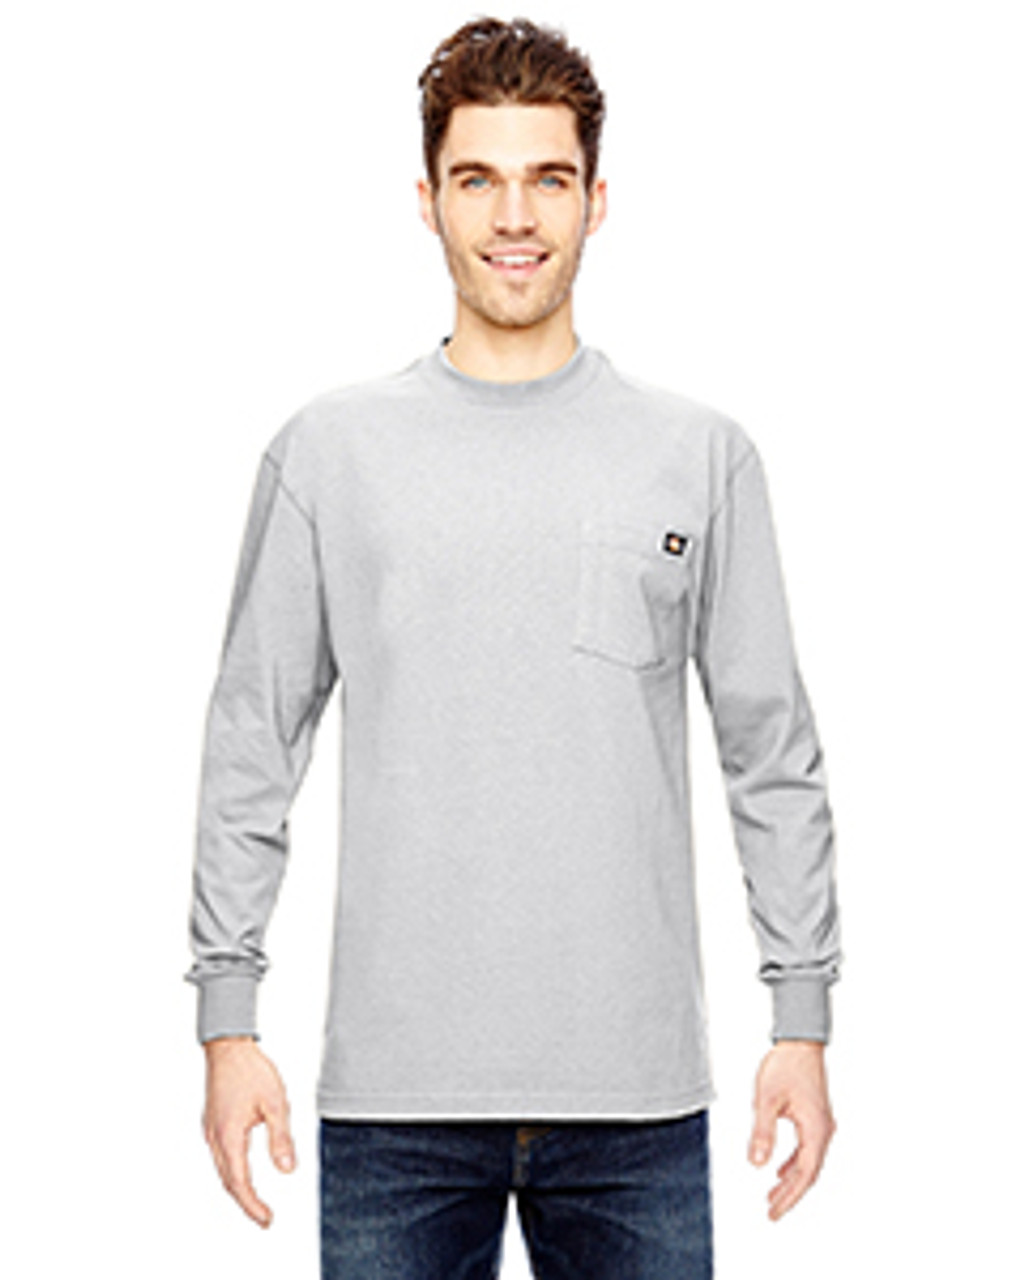 Dickies Plain Cotton T-Shirt Navy Men/'s Top Sizes S-XXXL